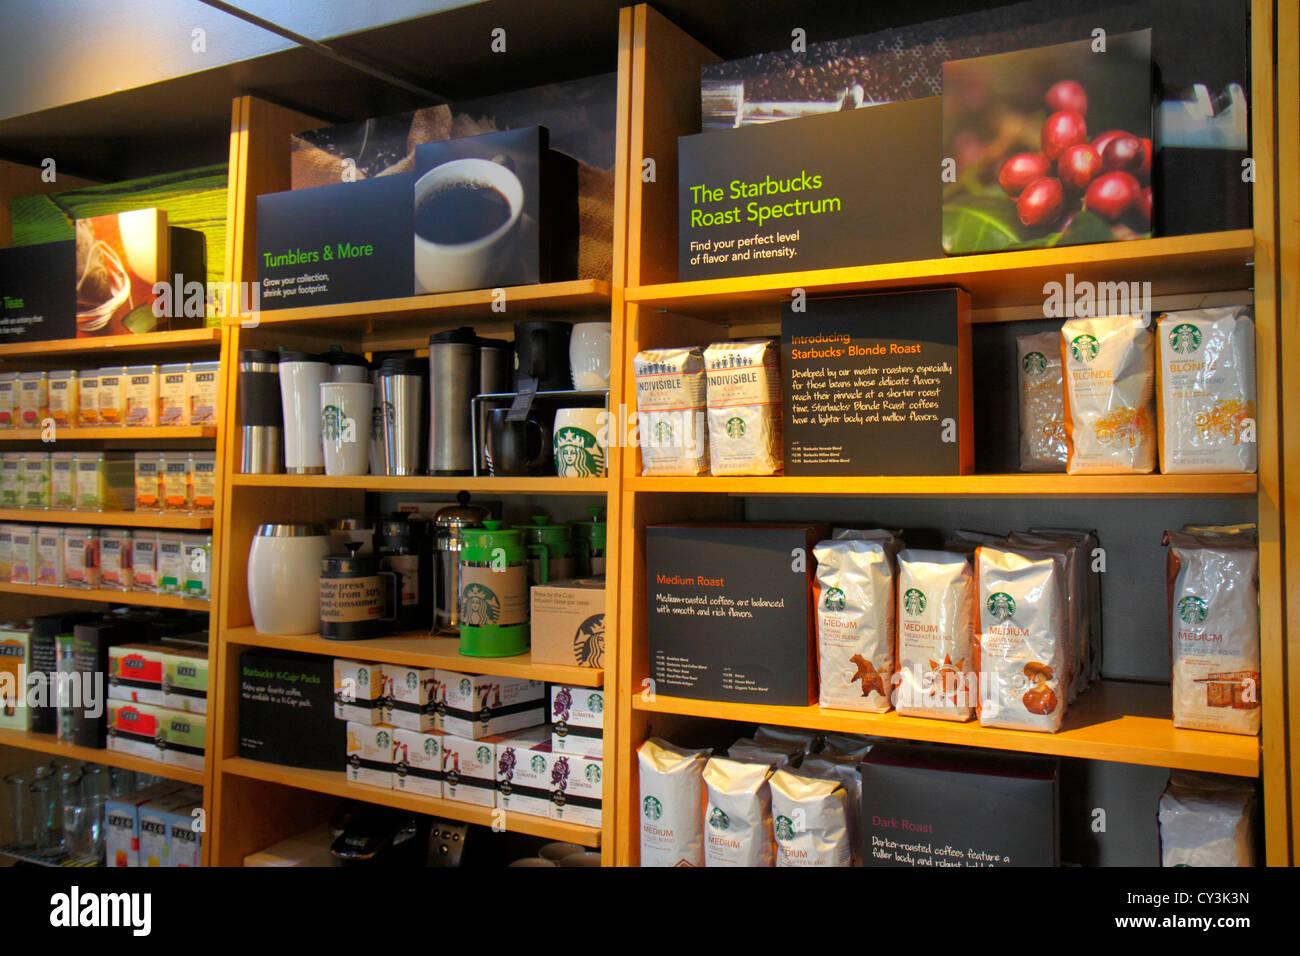 maine freeport main street route 1 starbucks coffee retail display